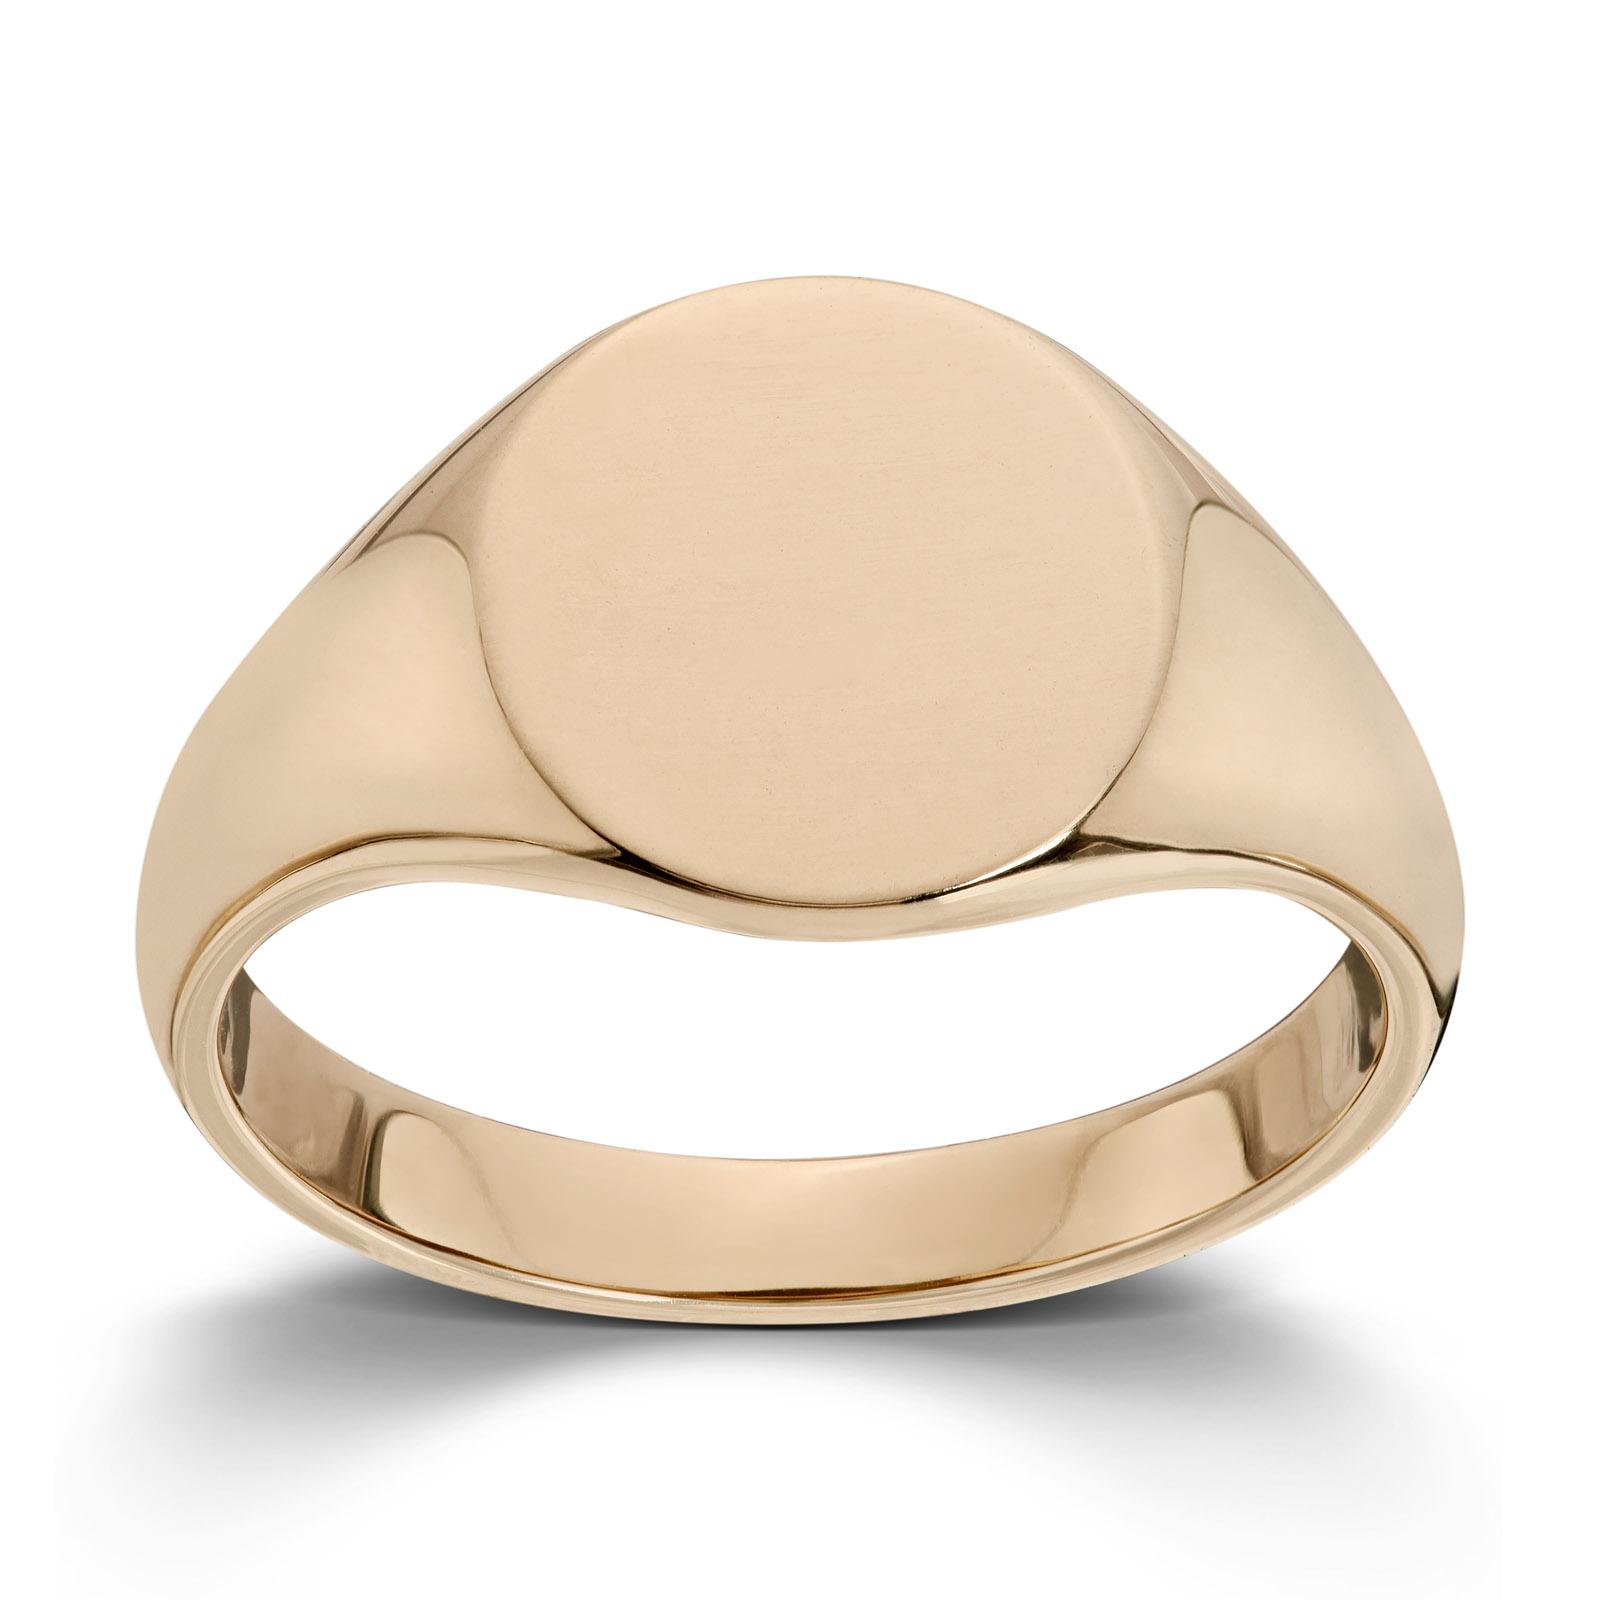 cdb675dd Mestergull Enkel signetring i gult gull MESTERGULL Ring